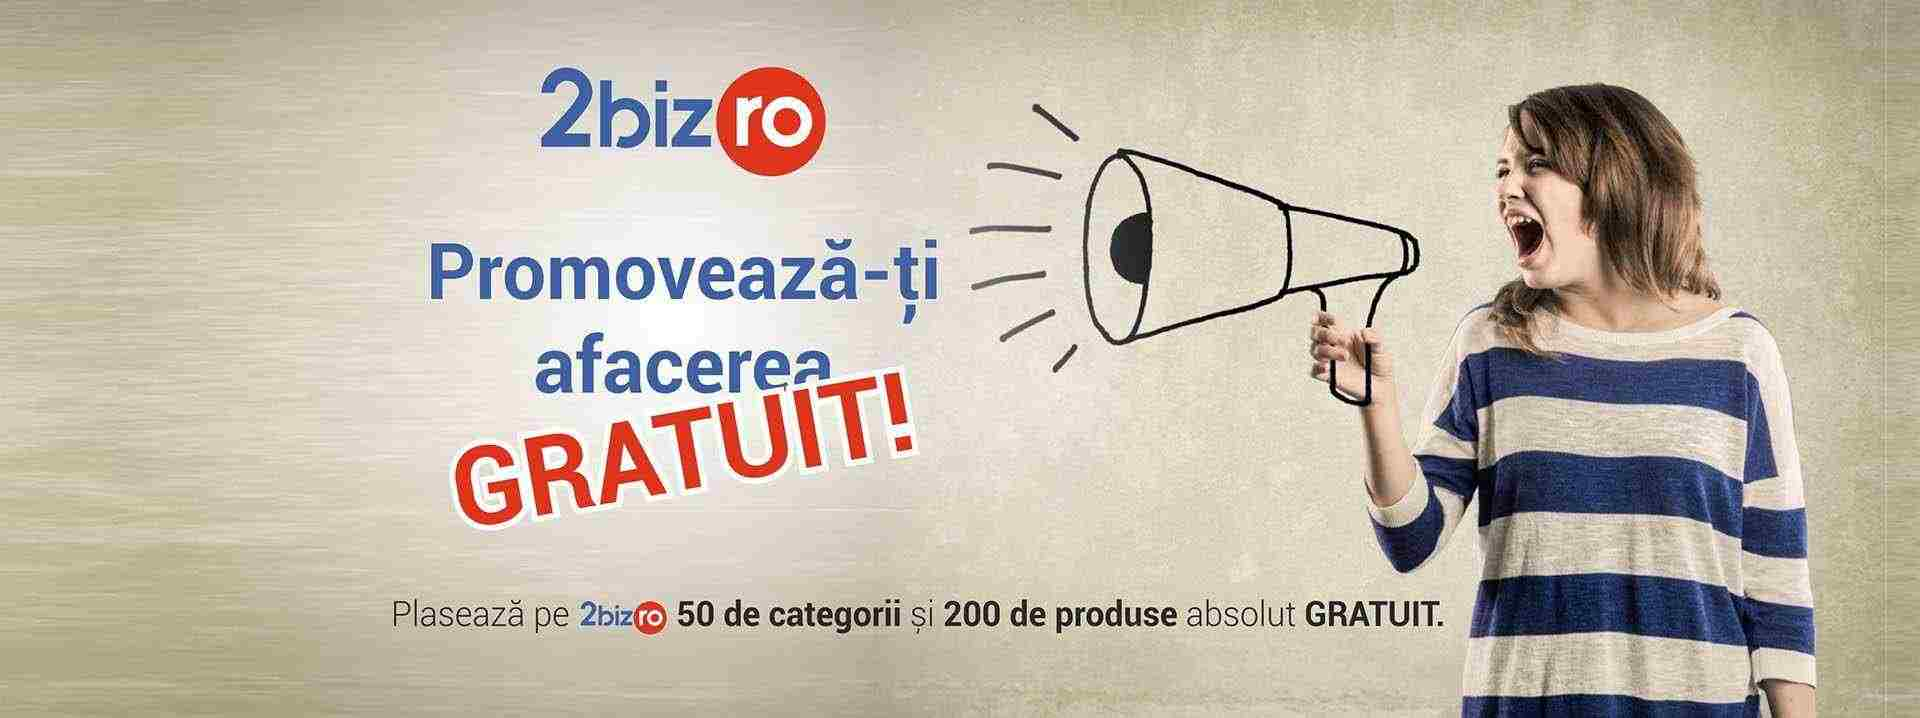 Banner Promovare 2Biz.ro